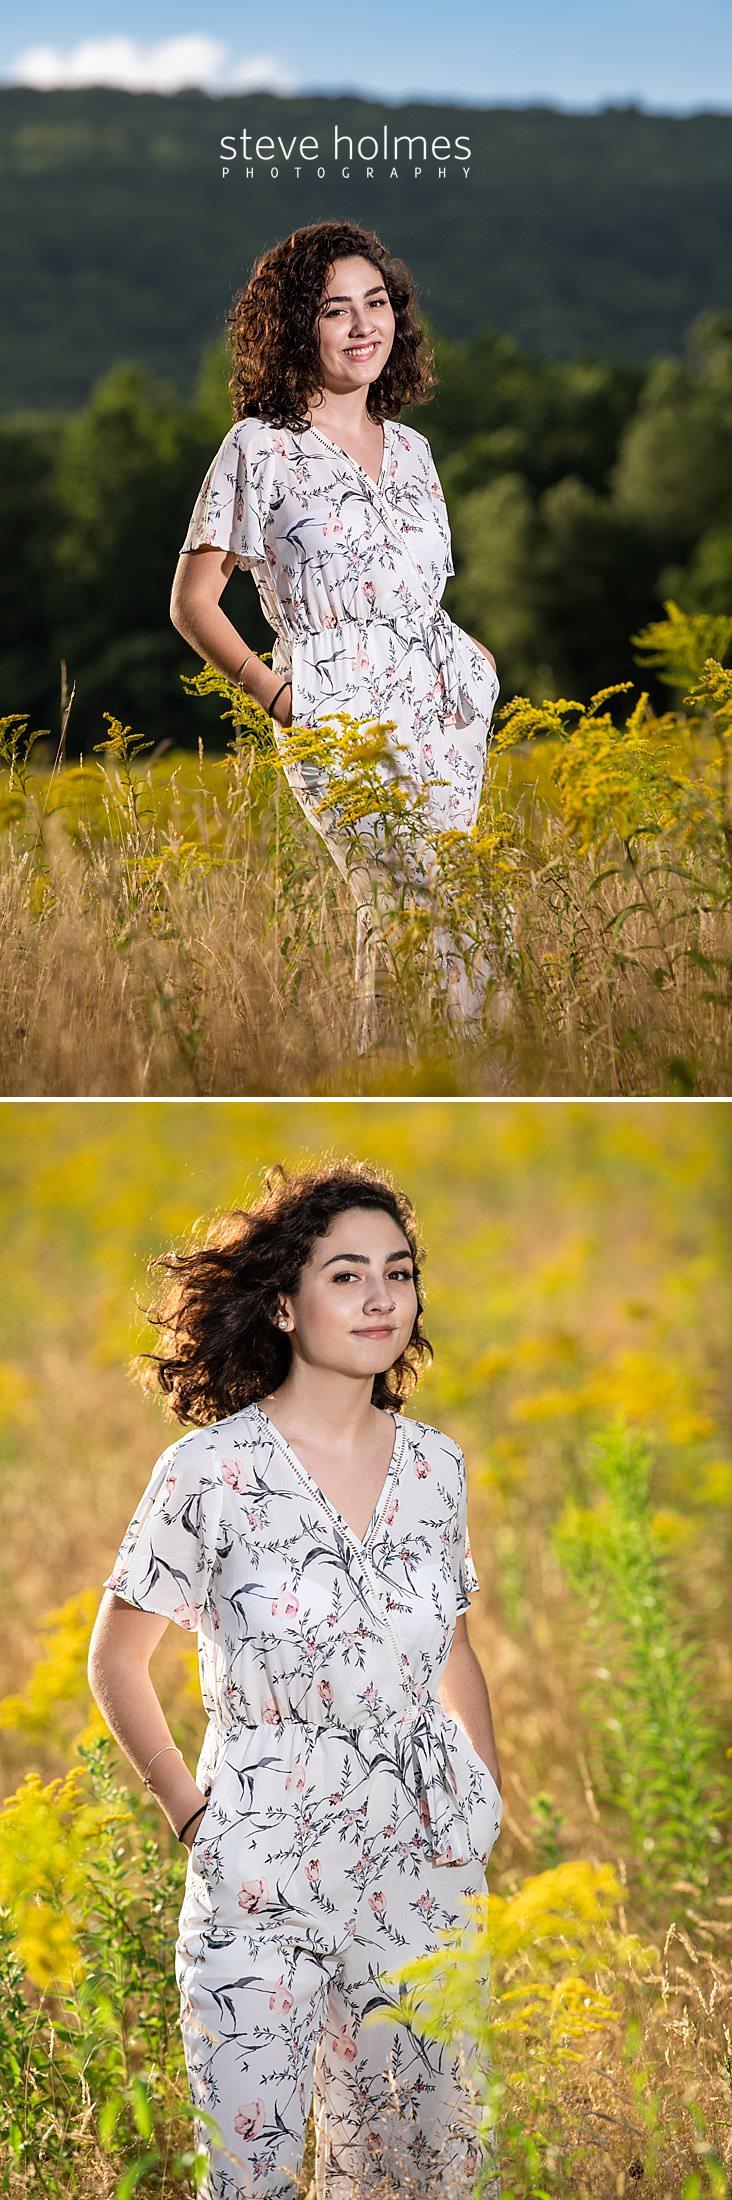 08_Curly haired brunette in jumper smiles for senior photo in New England field.jpg